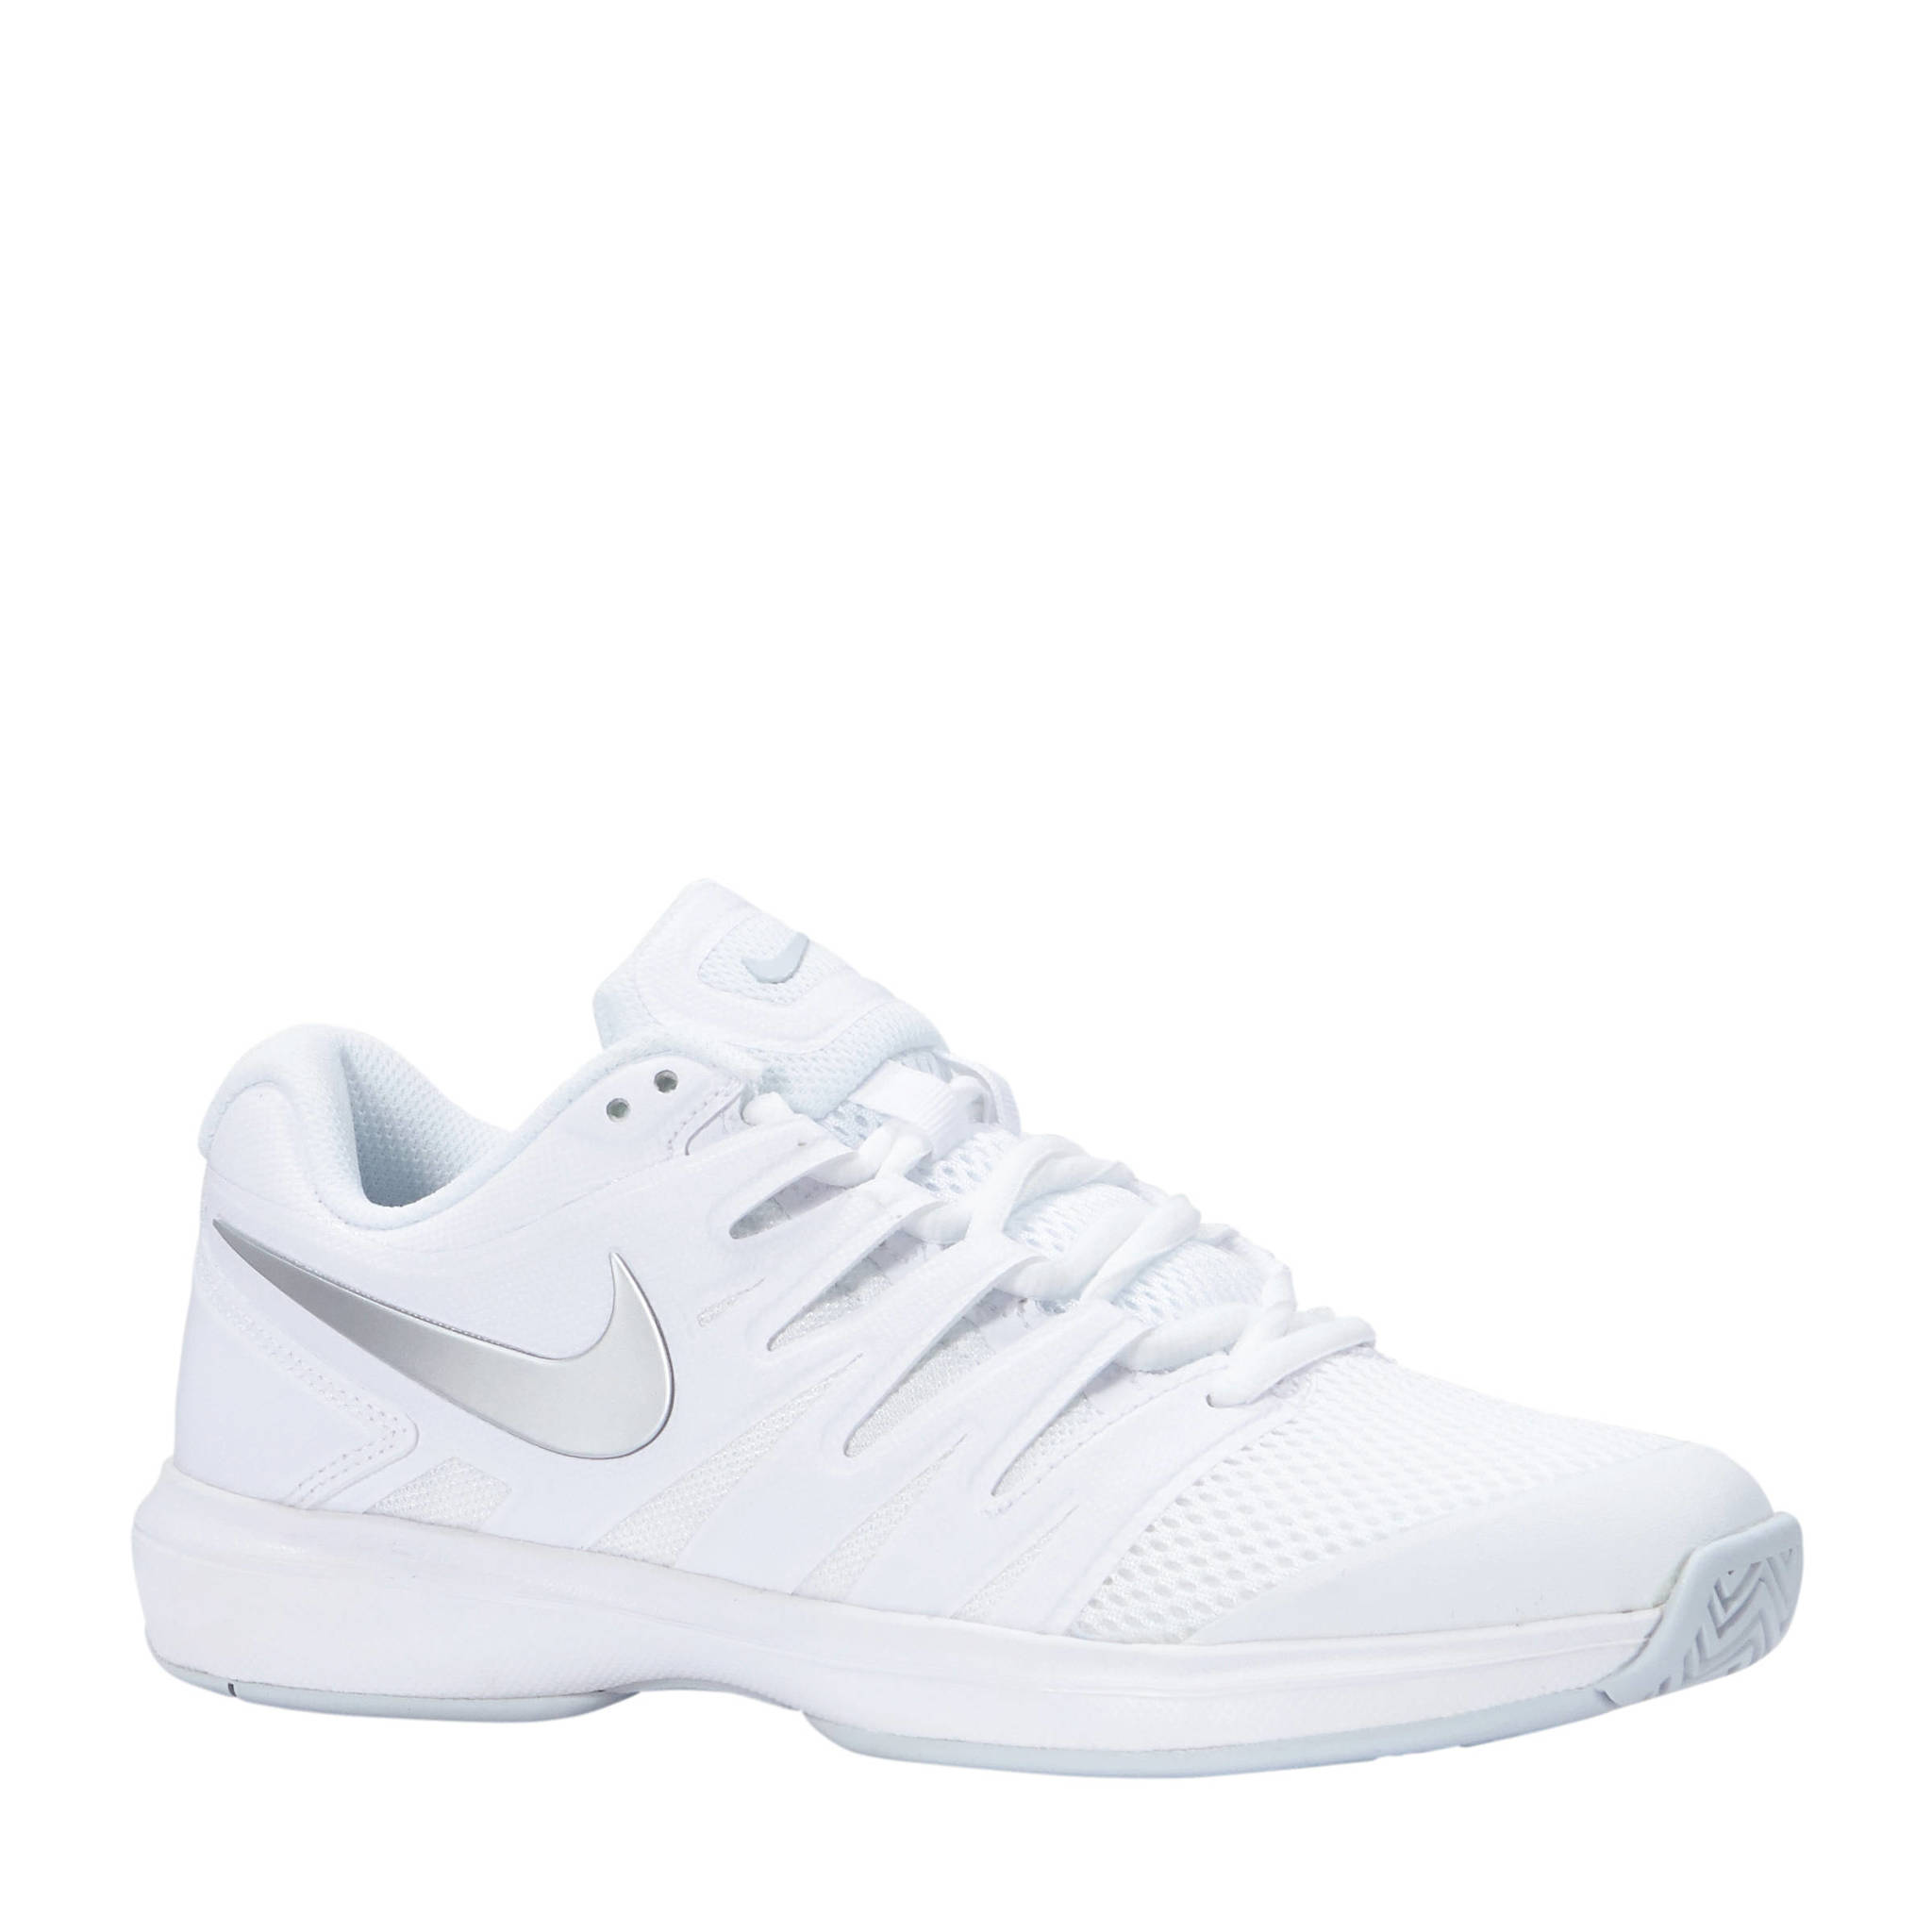 11b2d1ad585 Nike Air Zoom Prestige HC tennisschoenen wit | wehkamp